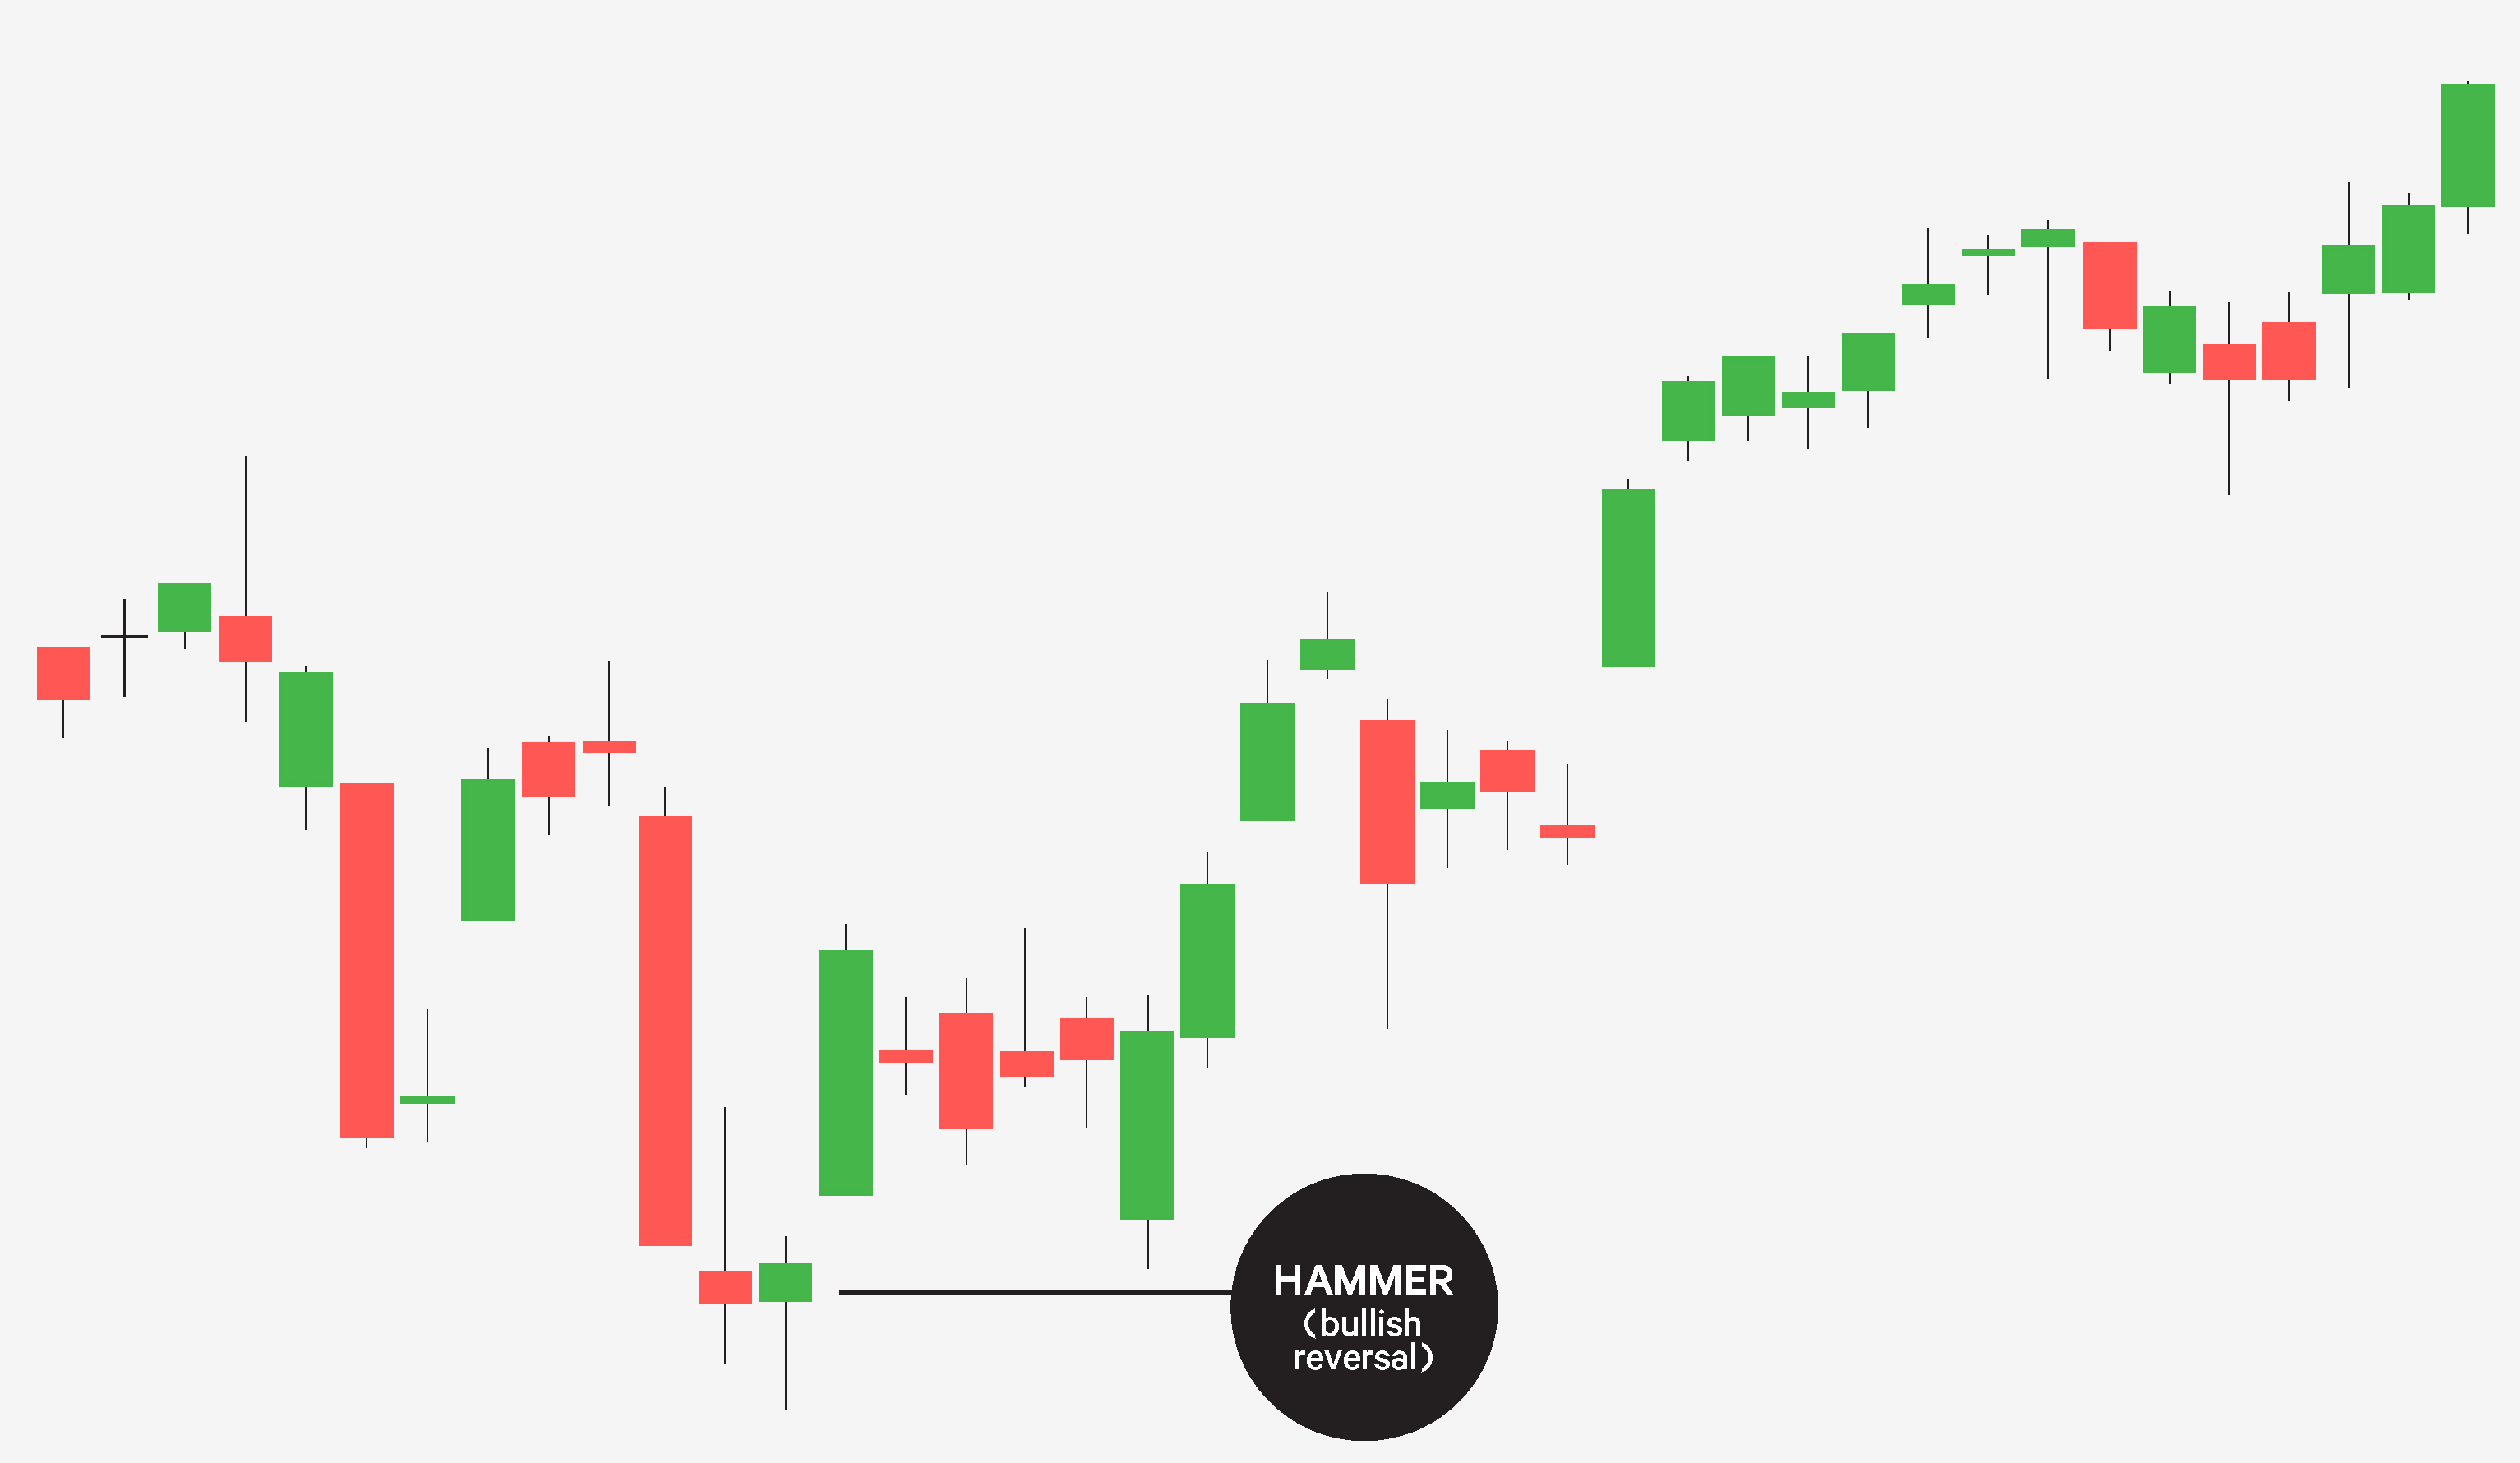 Hammer candlestick reversal pattern